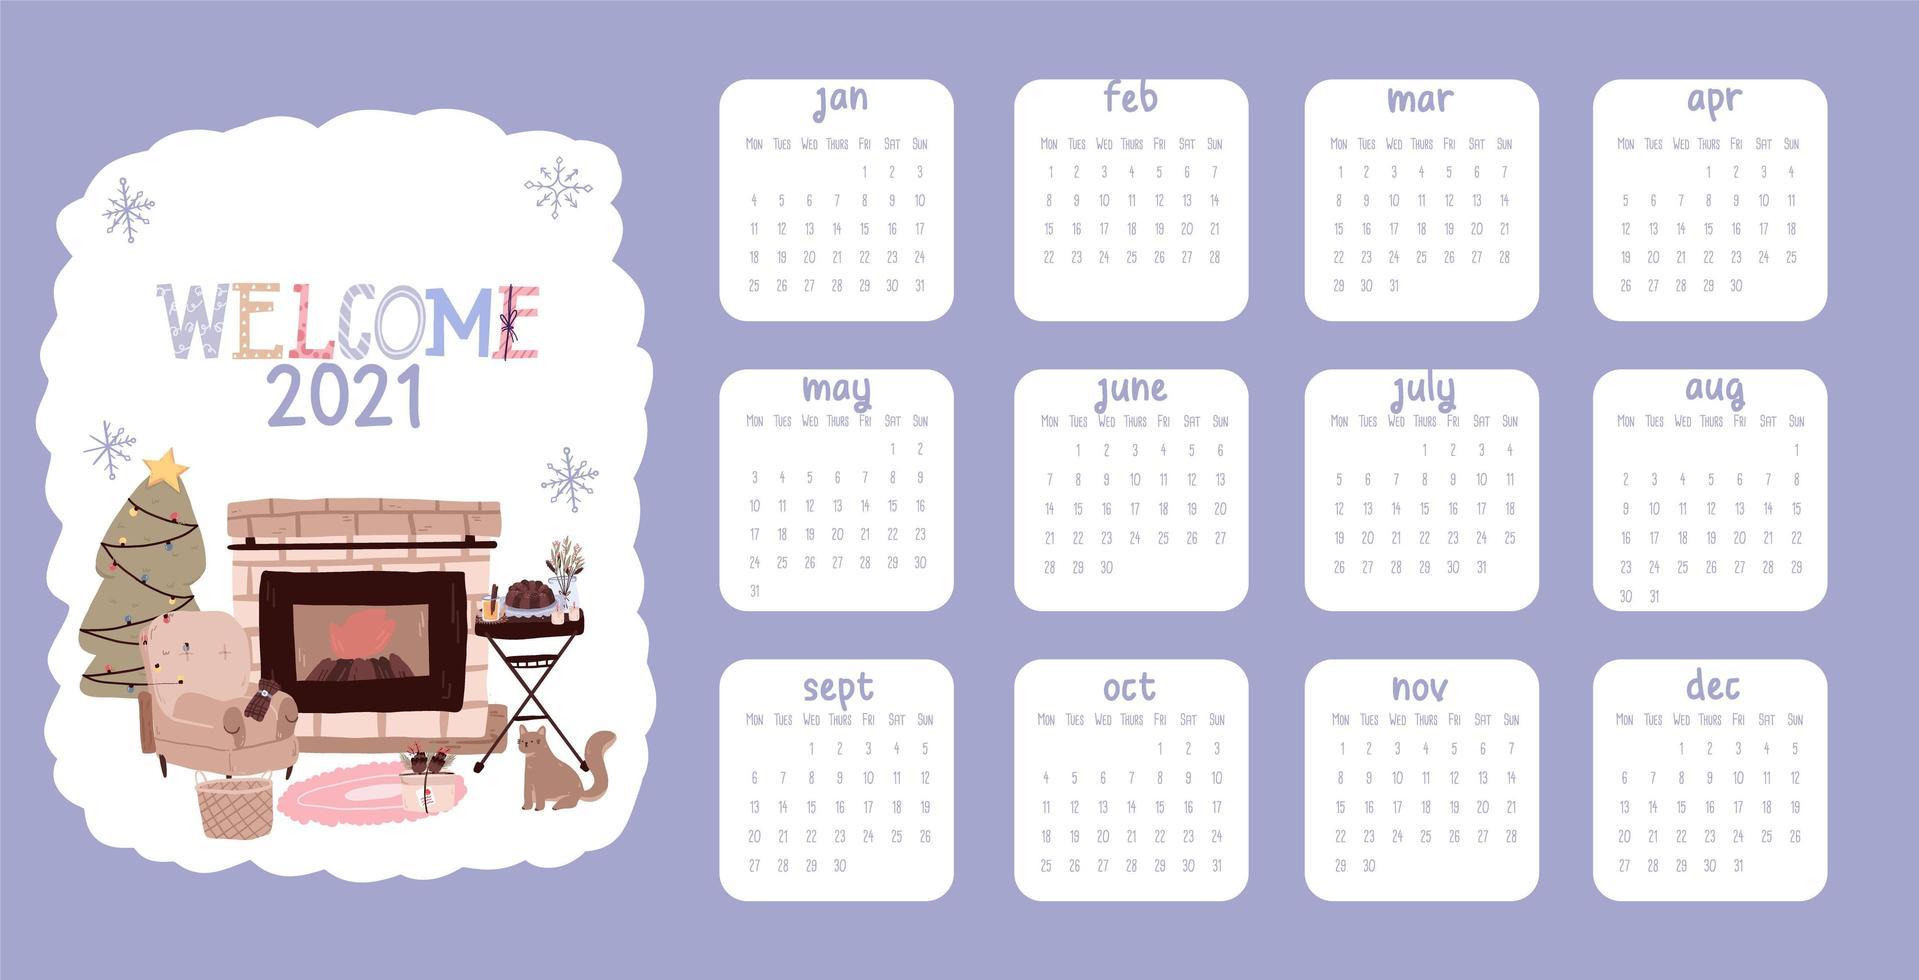 kerst 2021 kalender vector